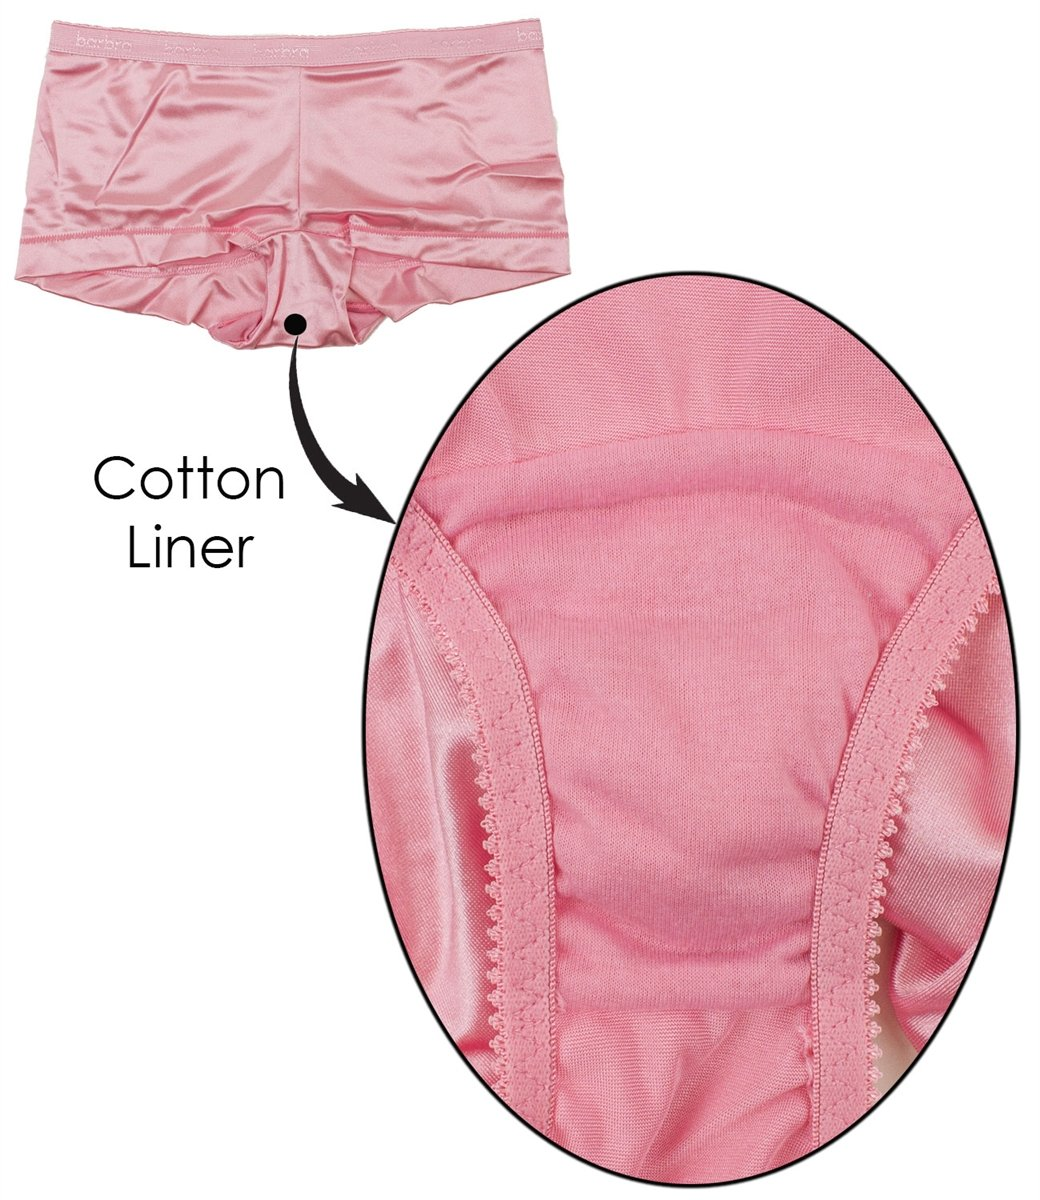 Barbra 6 pack Women's Satin Full Coverage Guaranteed Fit Boyshort Panties(3XL) by Barbra Lingerie (Image #5)